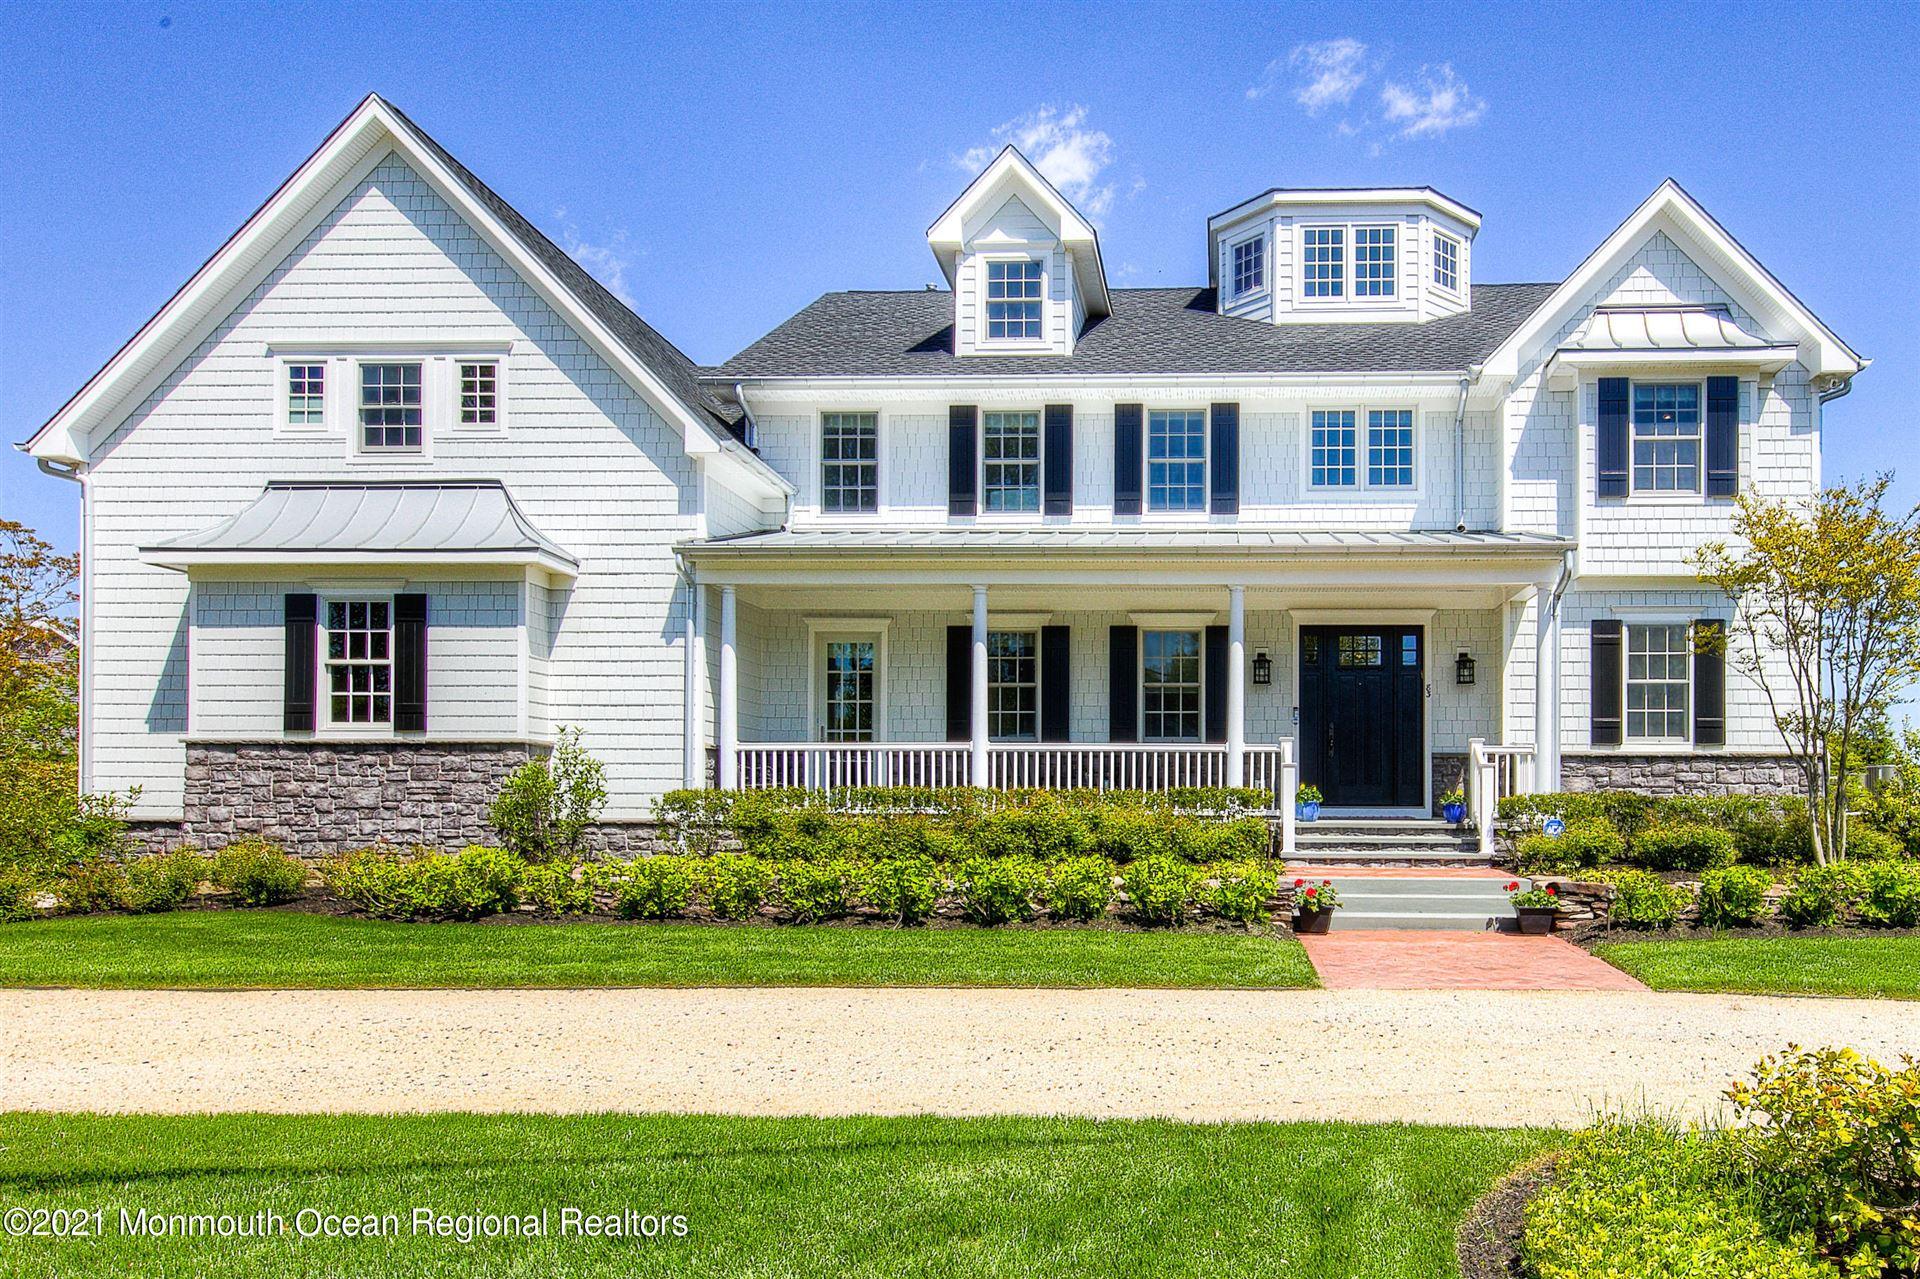 83 Bridgewaters Drive, Oceanport, NJ 07757 - MLS#: 22114932